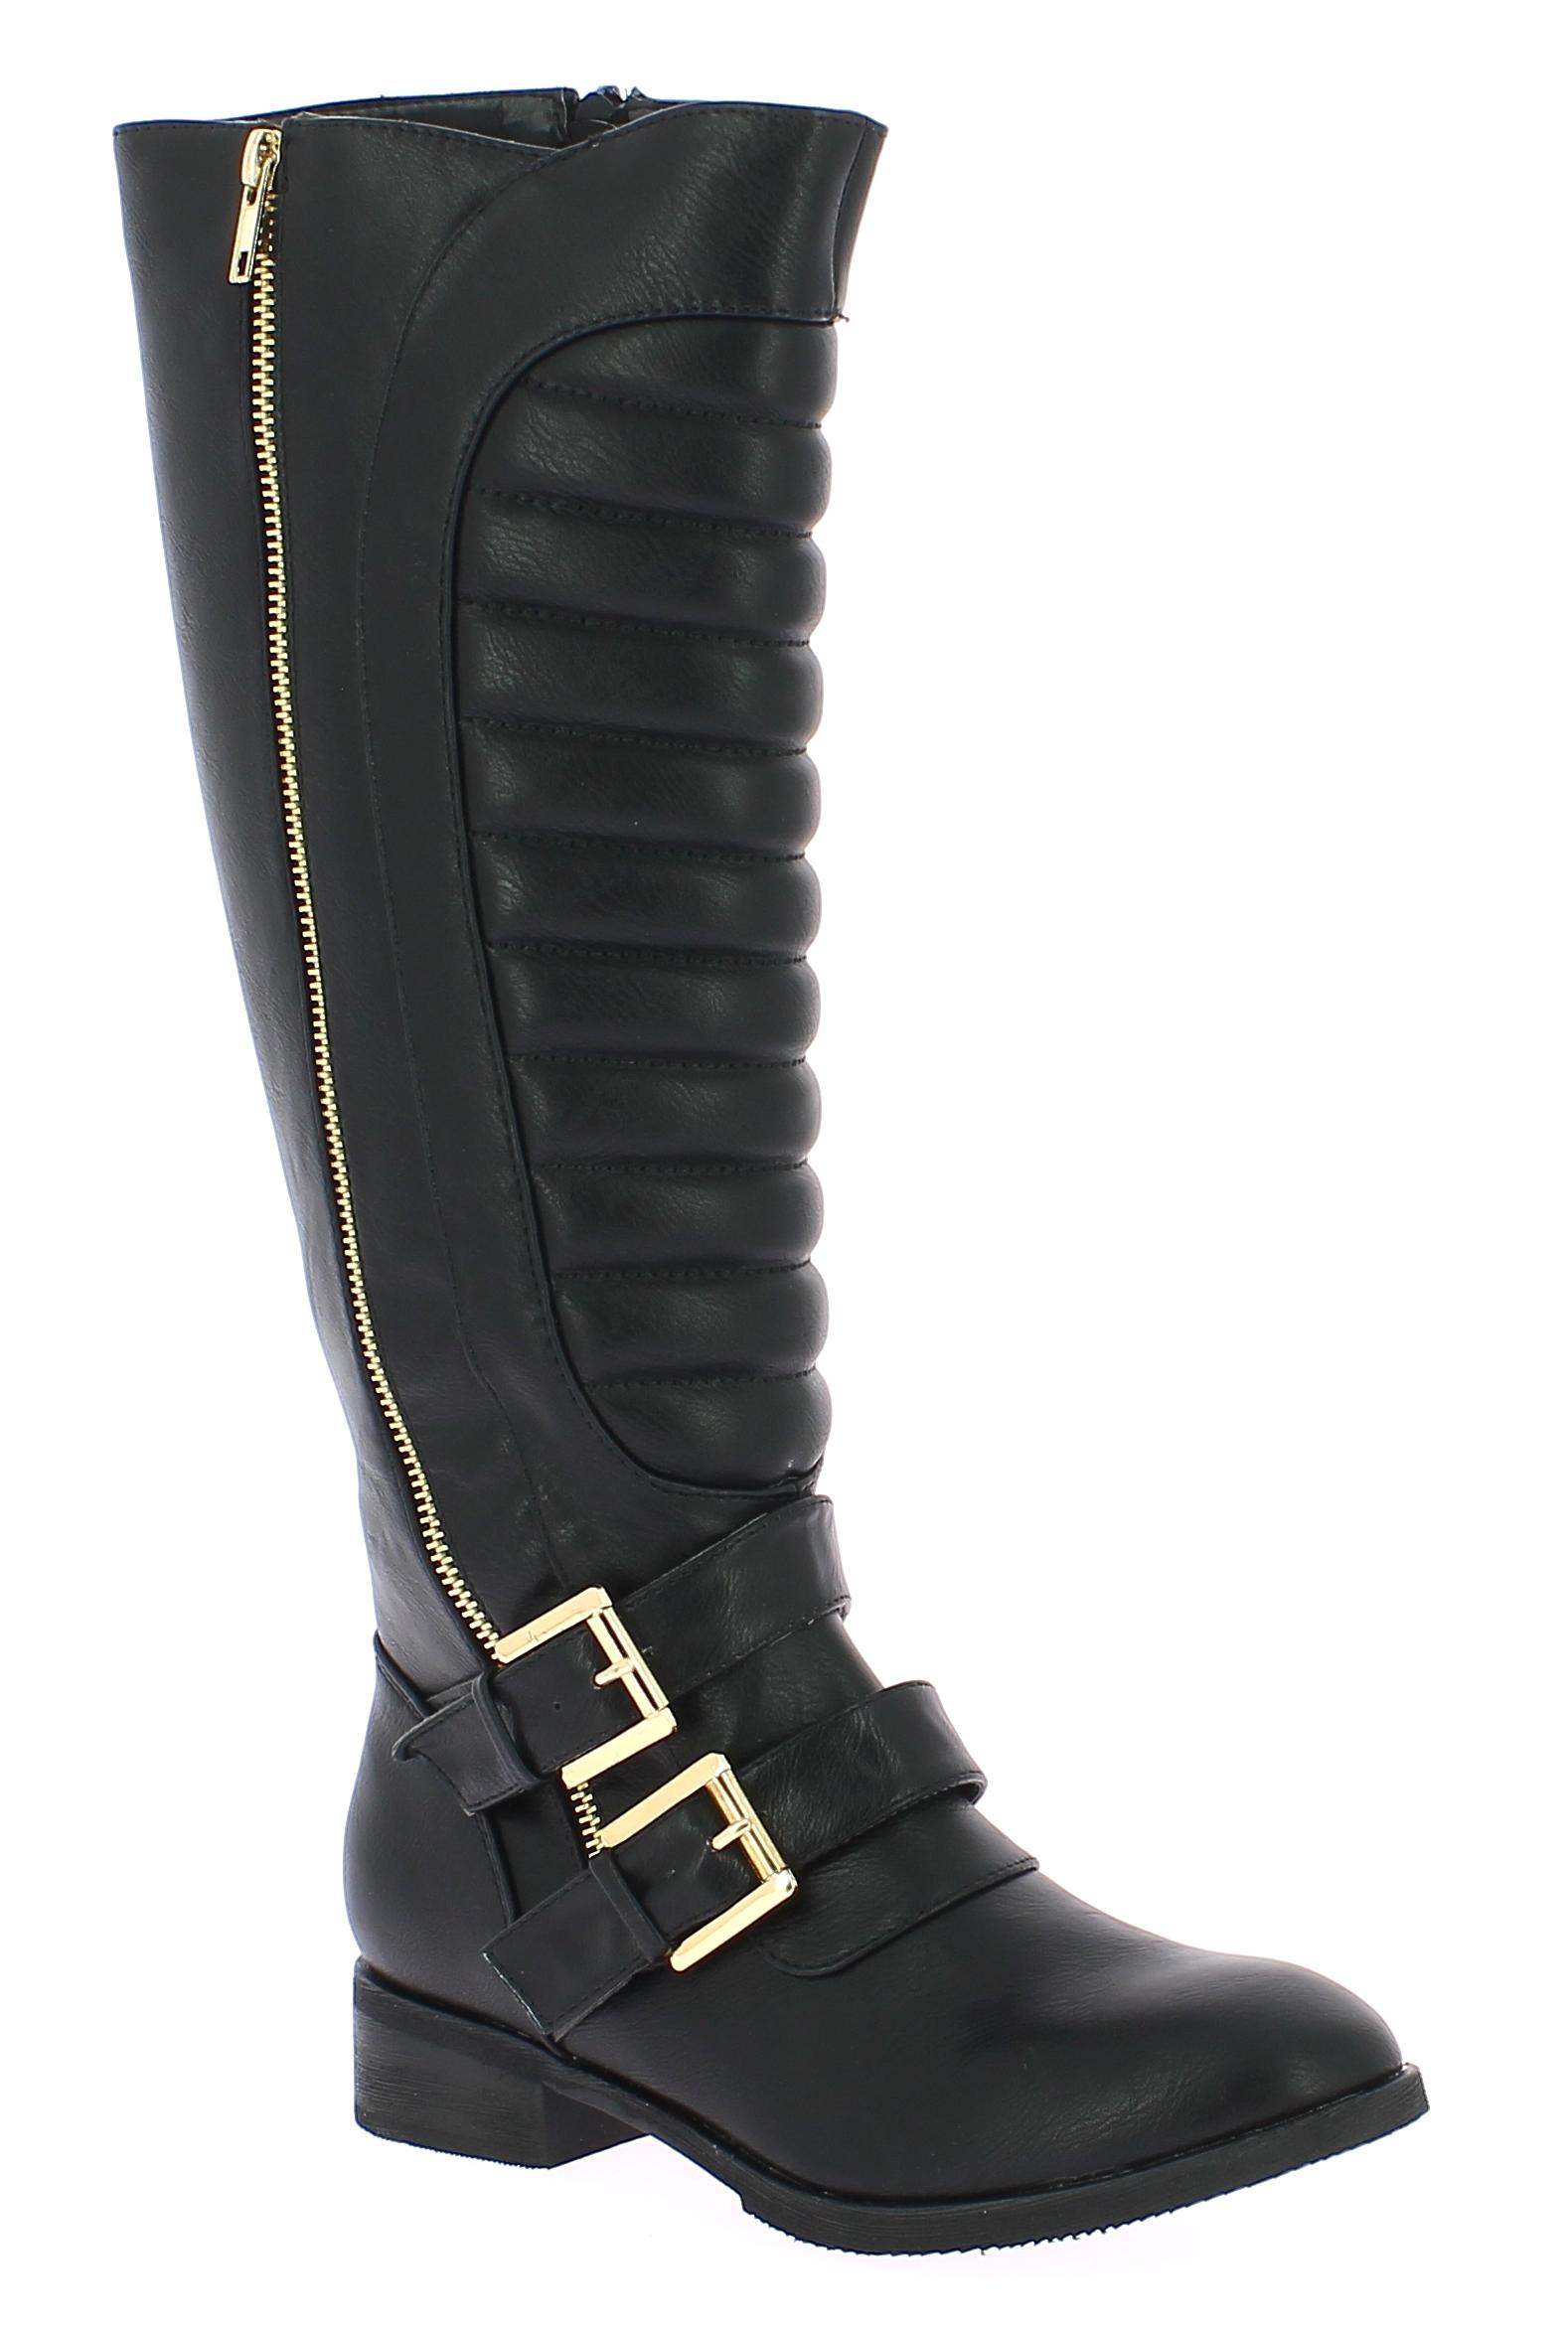 IQSHOES Γυναικεία Μπότα 2878125 Μαύρο - IqShoes - 2.878125 BLACK-black-39/1/15/2 παπούτσια  προσφορεσ